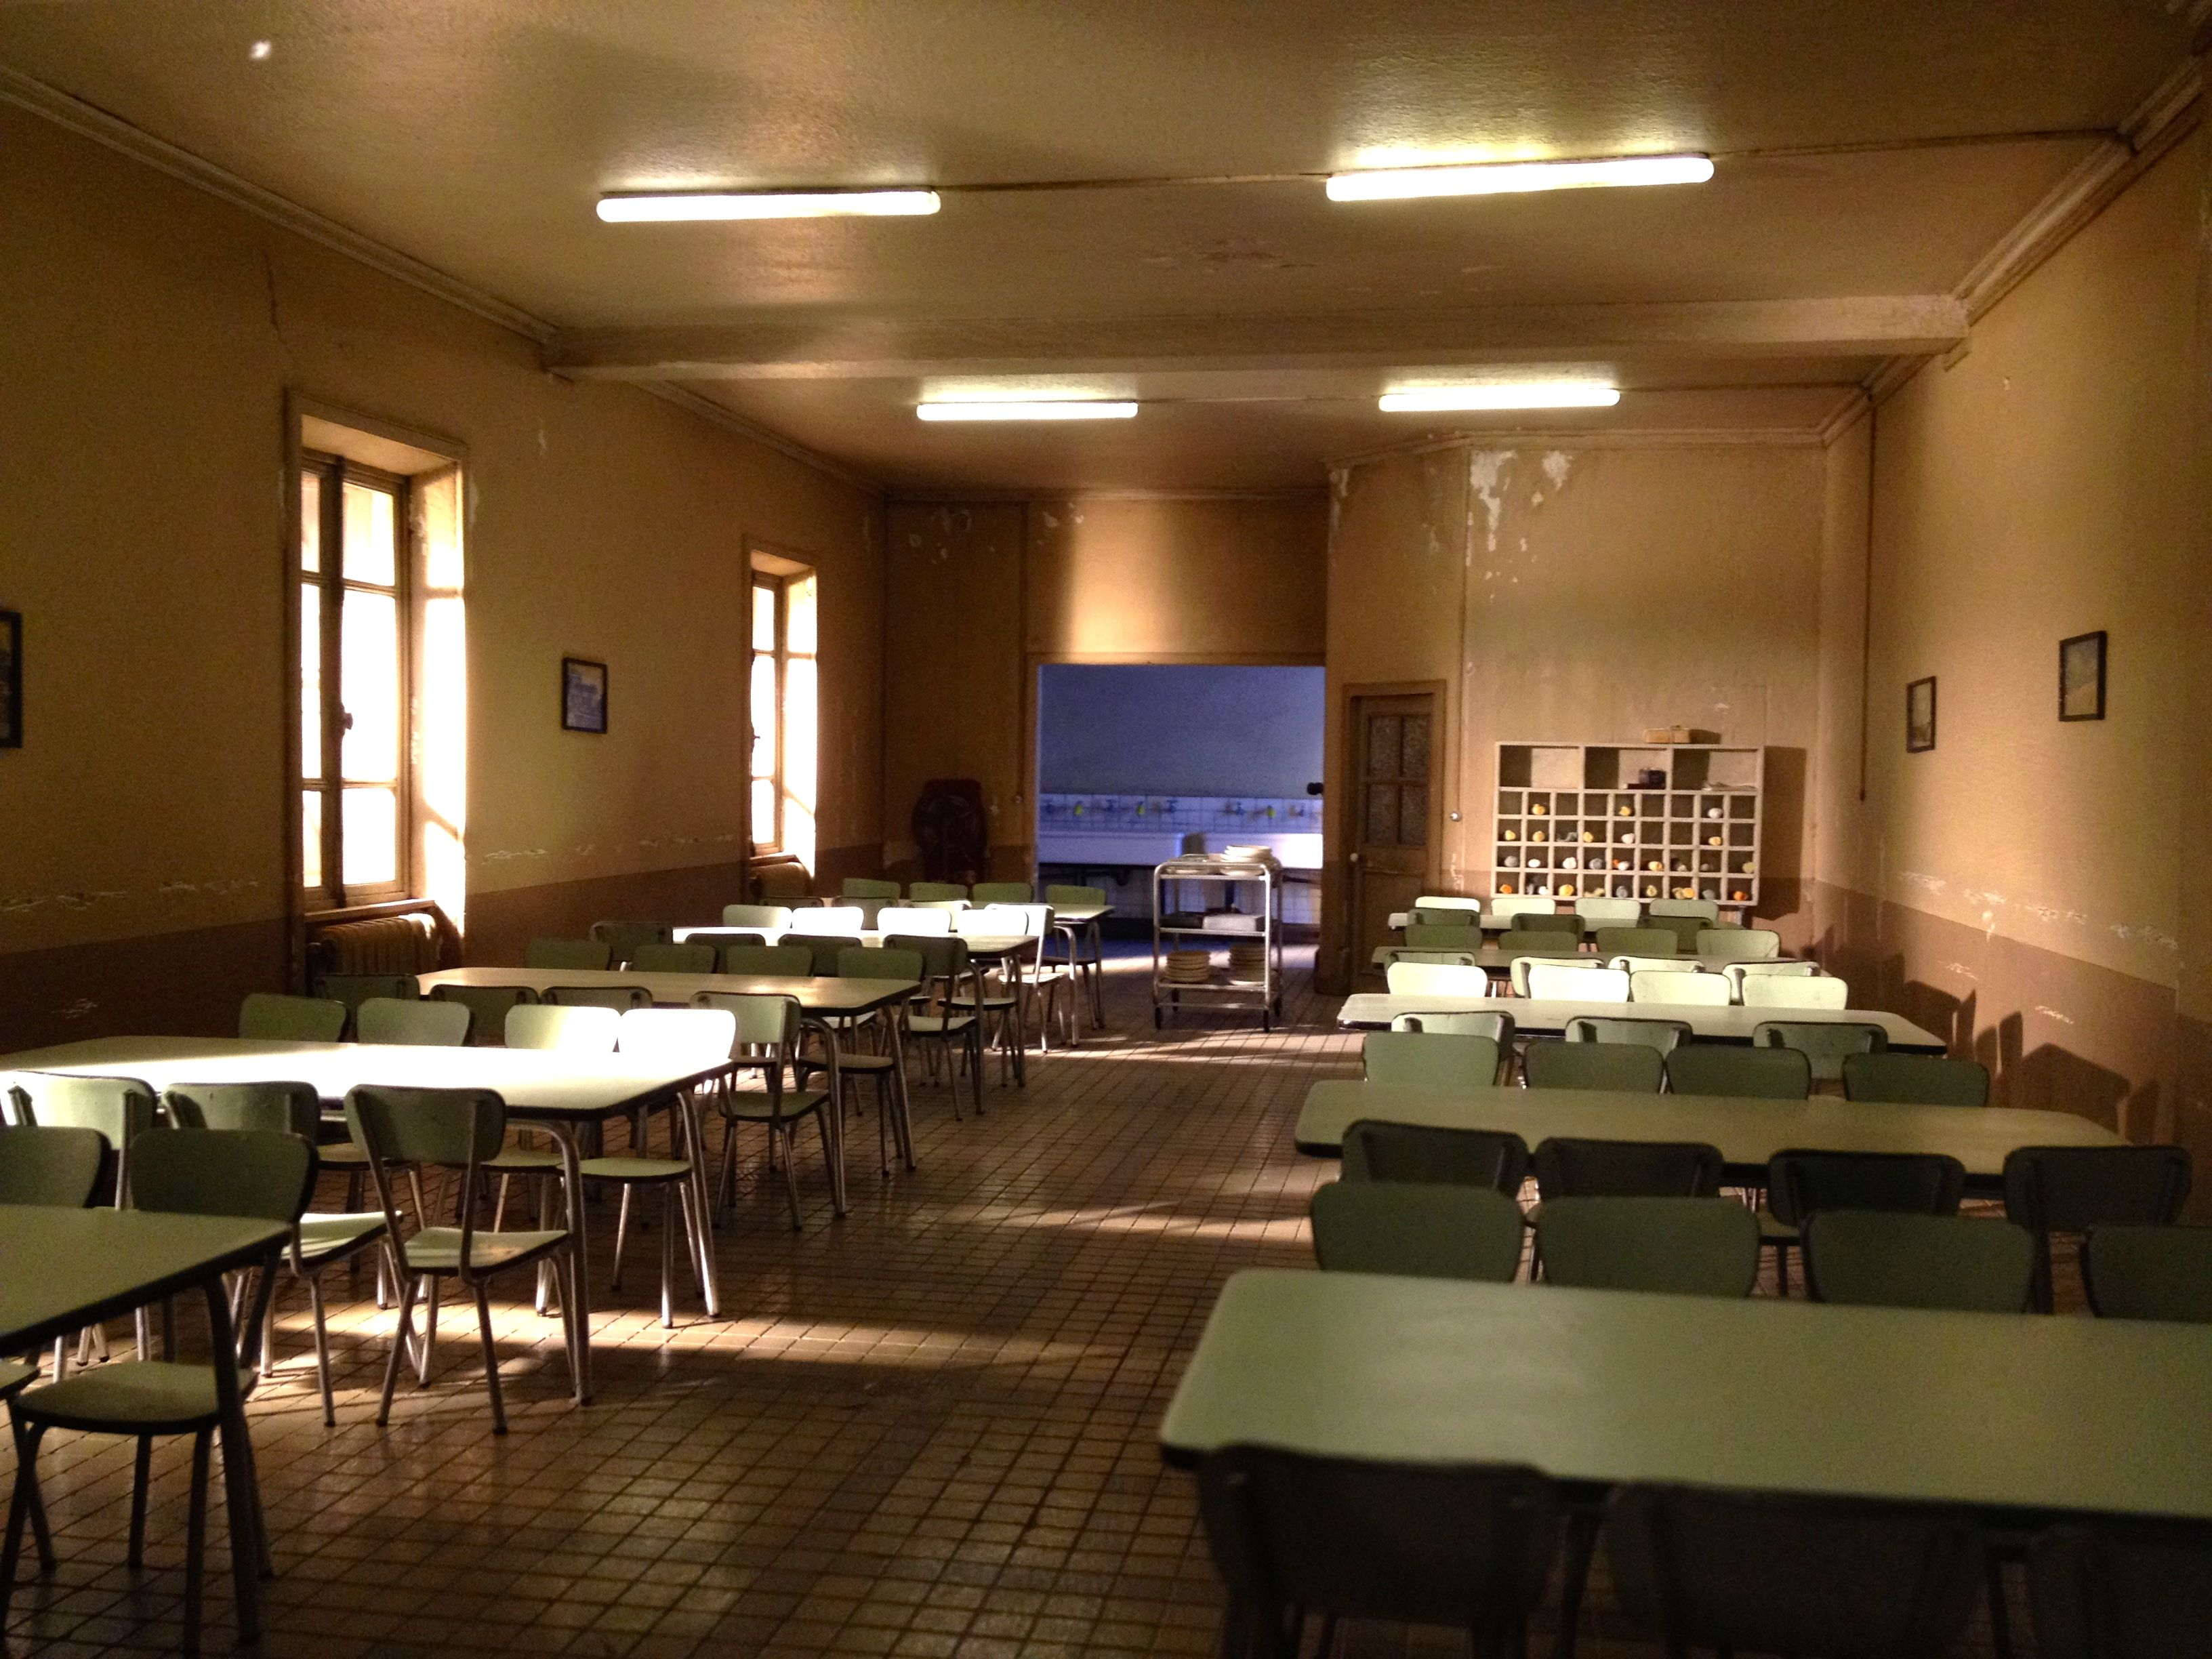 Dan Ohlmann's miniature dining hall, seen at http://www.museeminiatureetcinema.fr/accueil_eng.html